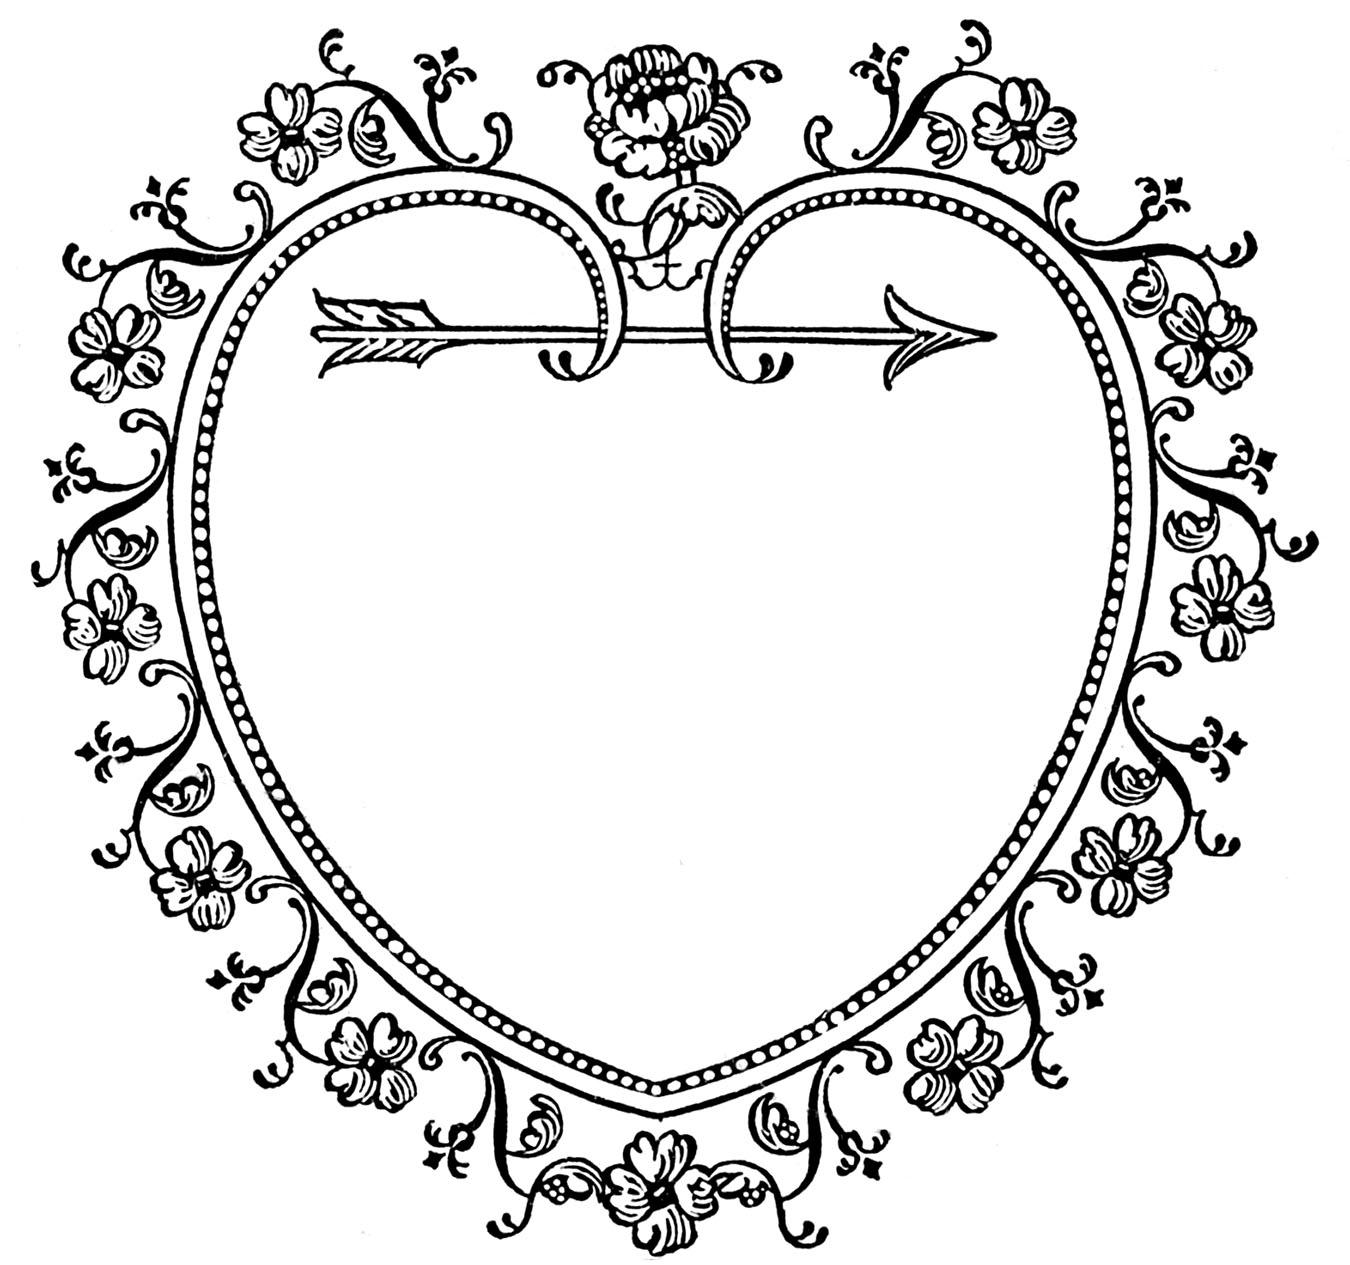 1350x1265 Heart Line Drawing Clip Art